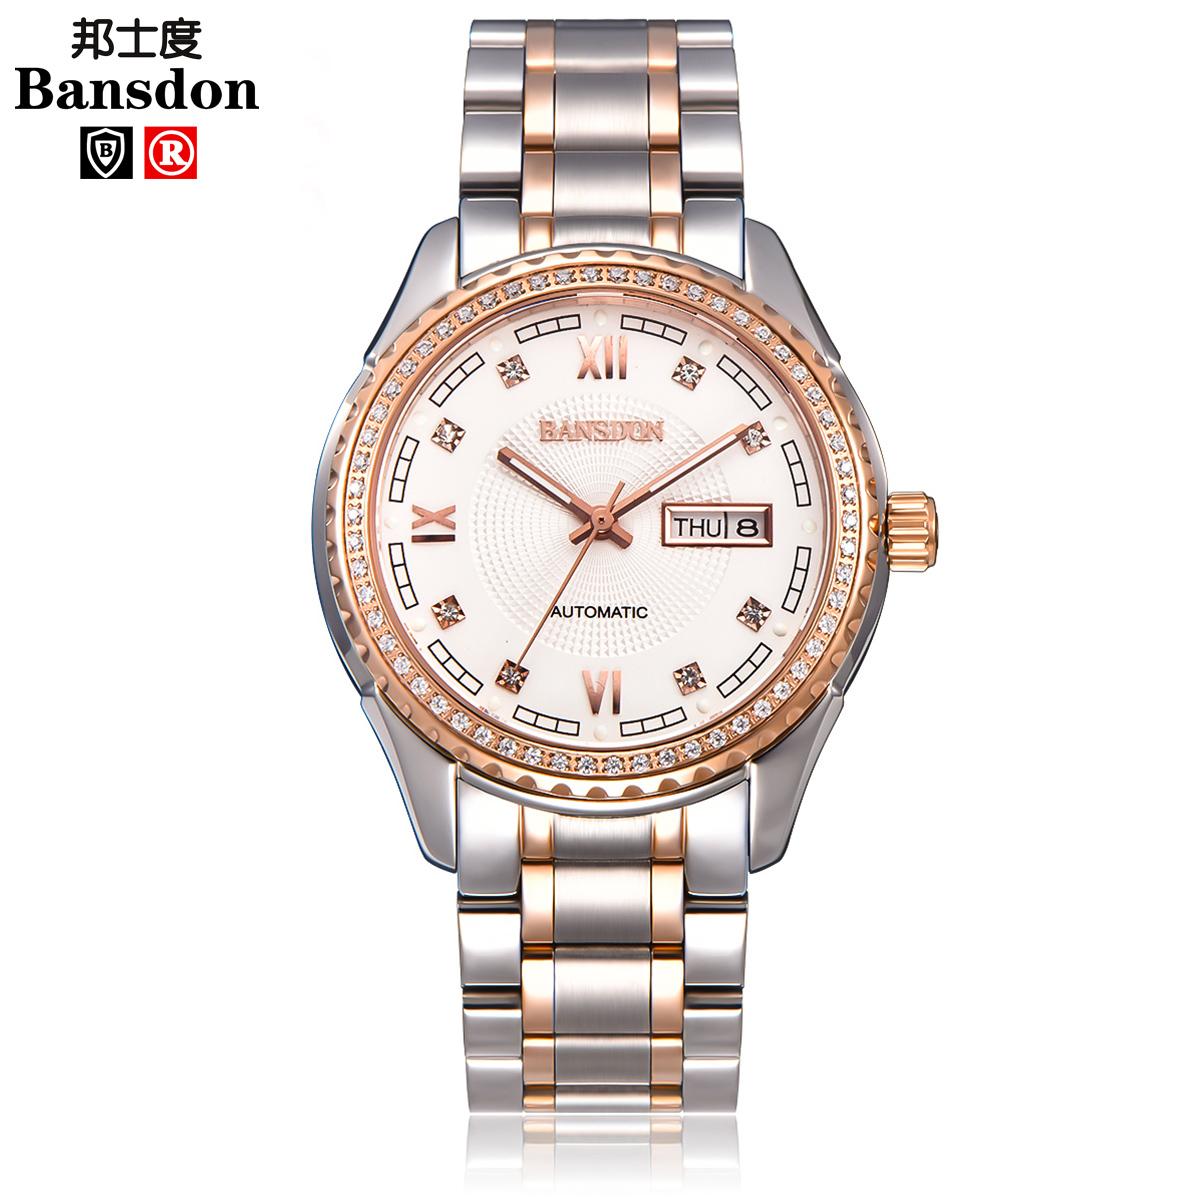 Authentic bonshidu watch mens fully automatic mechanical watch mens watch set with diamond waterproof luminous steel belt gold watch